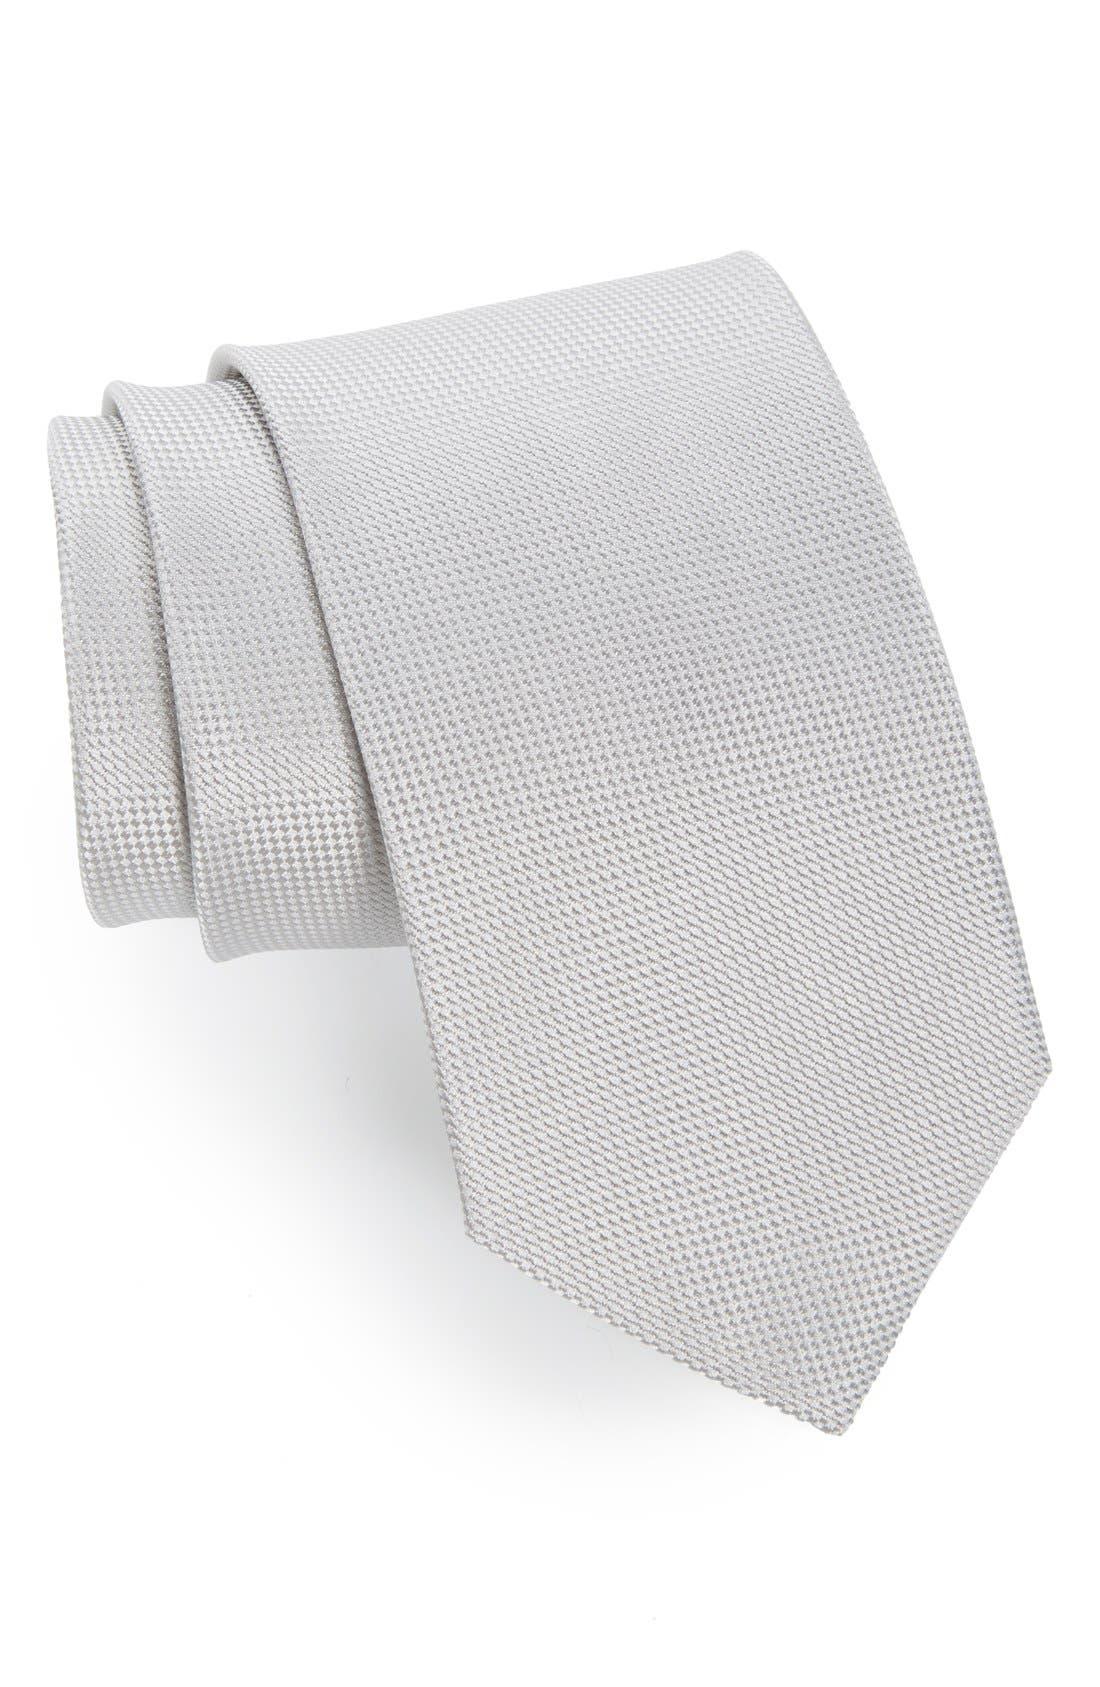 Main Image - John W. Nordstrom® 'Ryder' Silk Tie